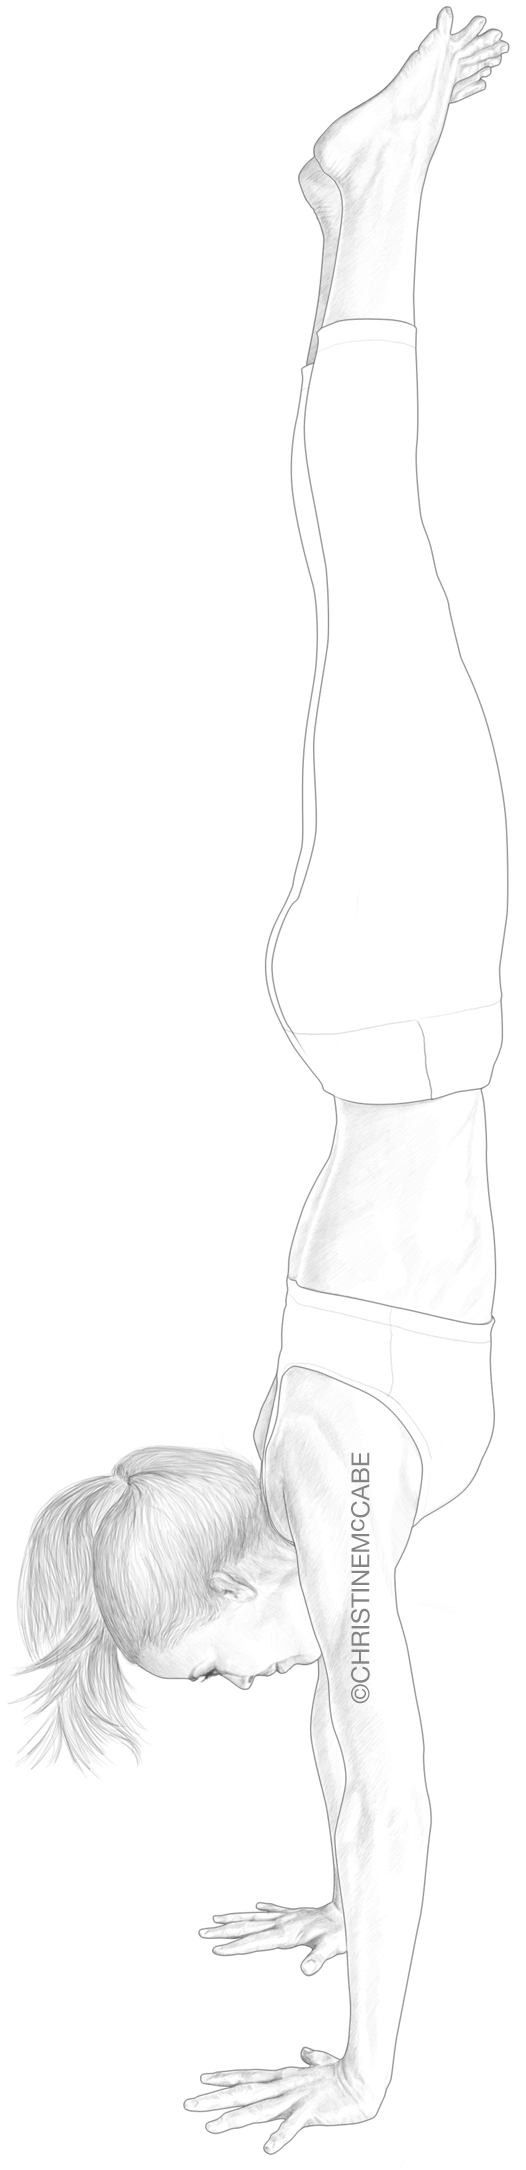 Anatomy of a Yogi - Handstand.jpg